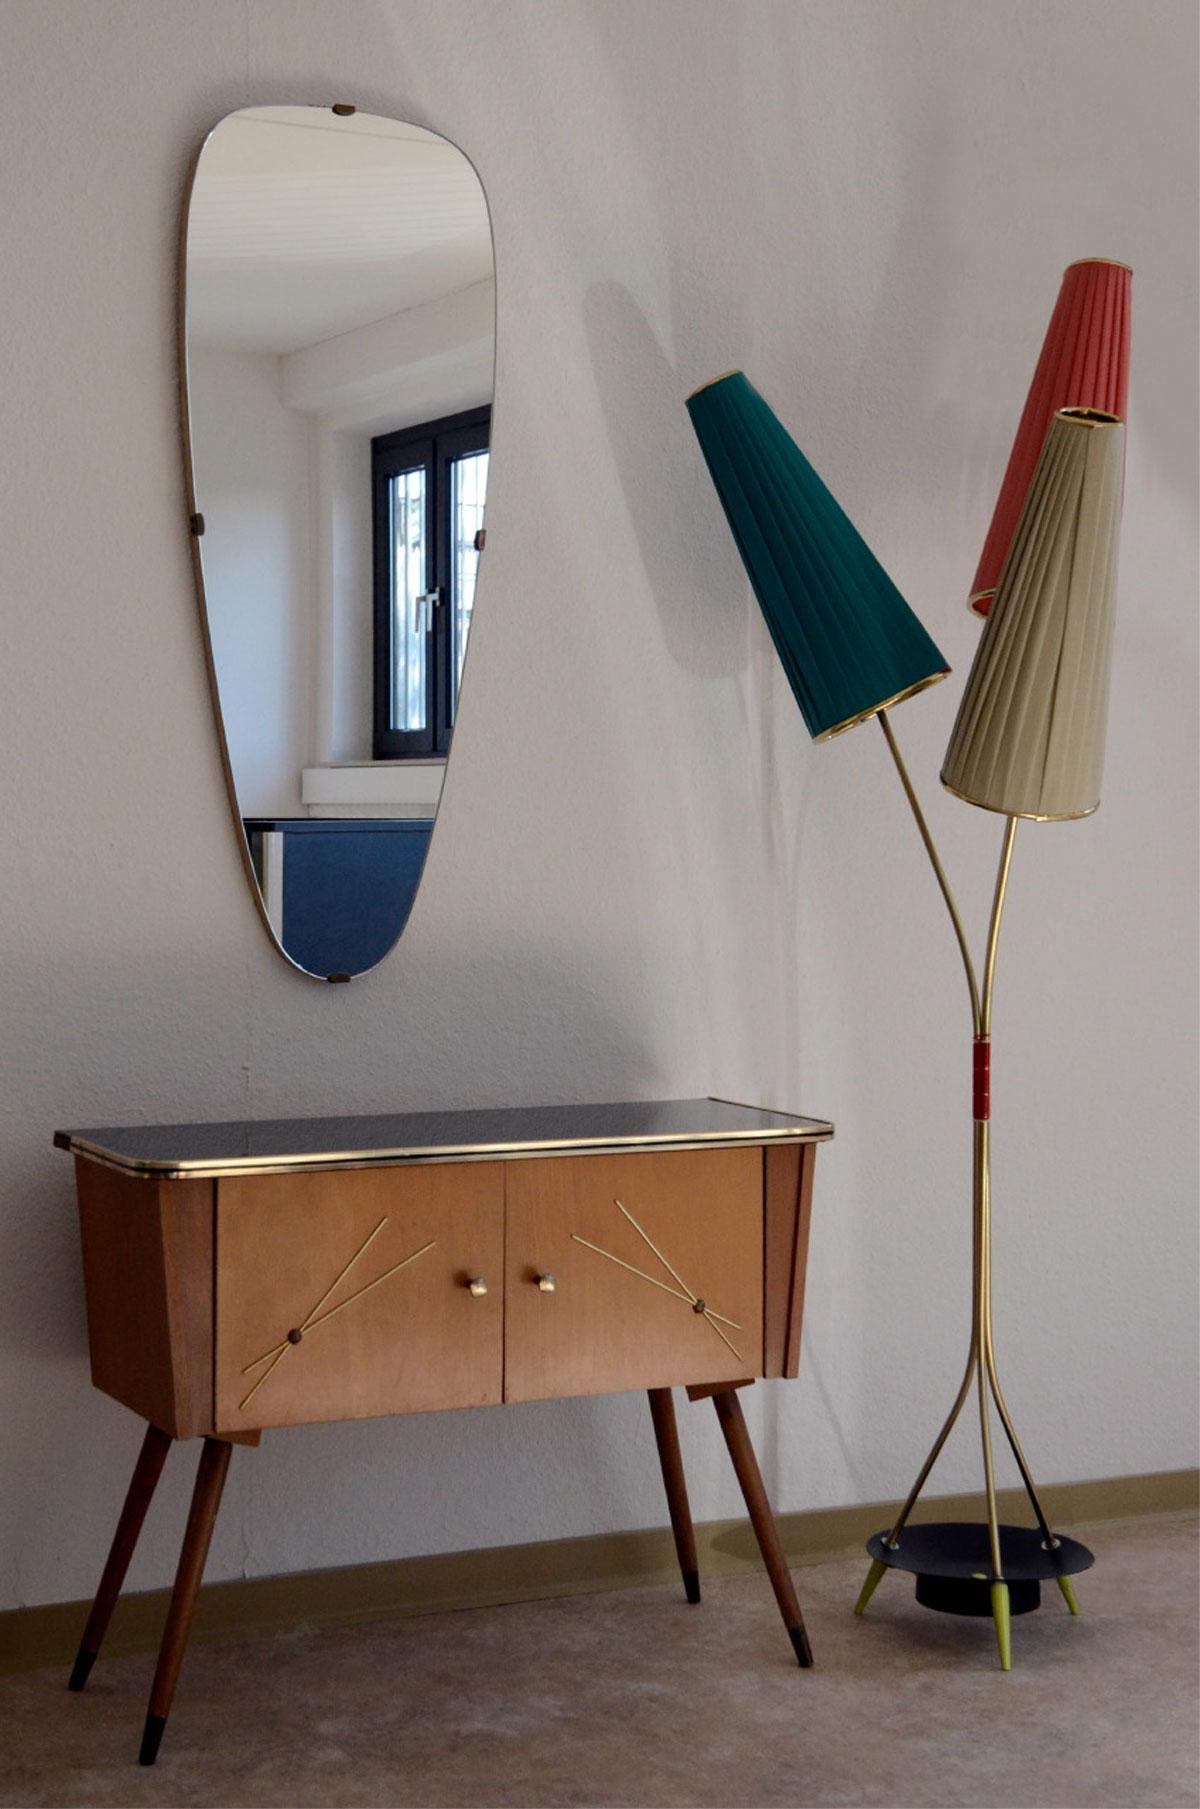 50er 60er jahre t tenlampe lampe stehlampe rockabilly tulpenlampe nierentisch ebay. Black Bedroom Furniture Sets. Home Design Ideas